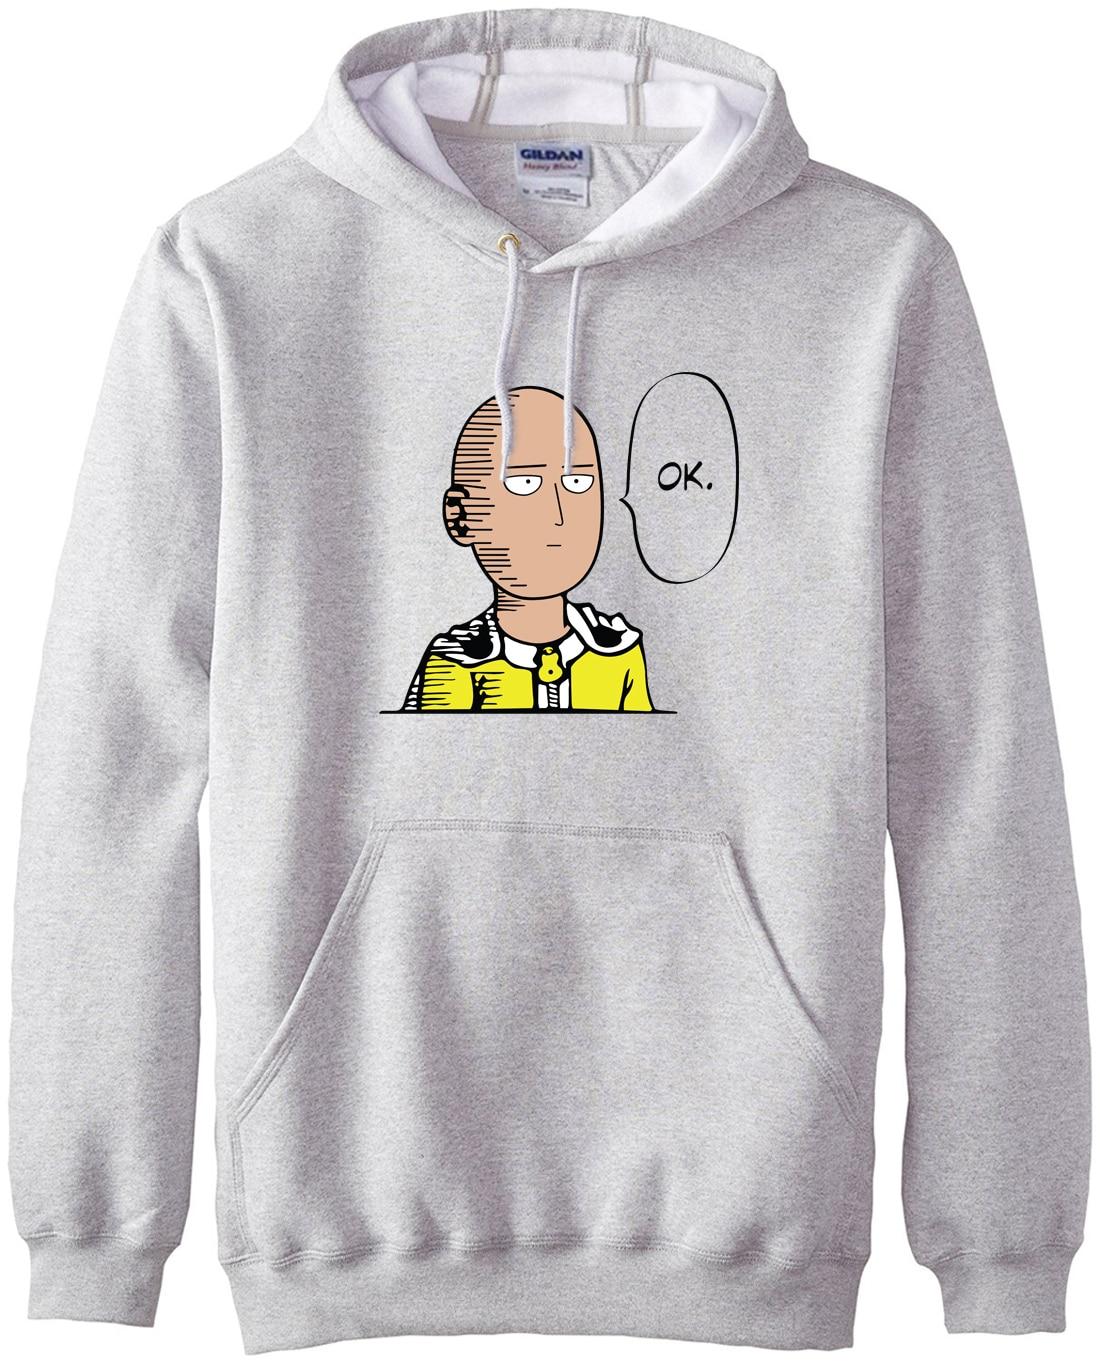 New Arrival Anime One Punch Man Hoodies OK Printed Men Sweatshirts 2019 Spring Winter Warm Fleece Loose Fit Men's Sportswear